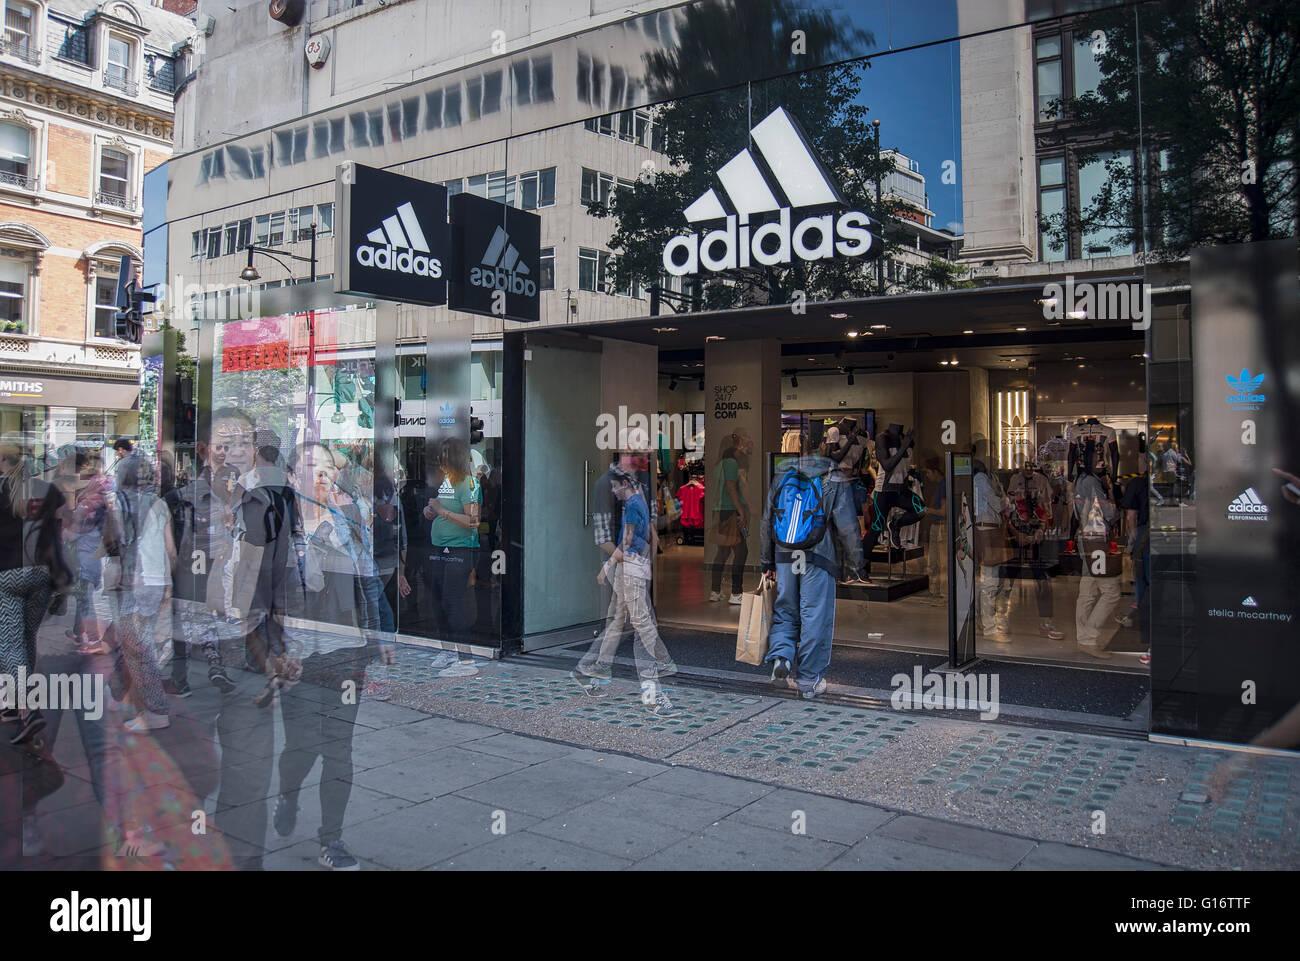 adidas shopping online